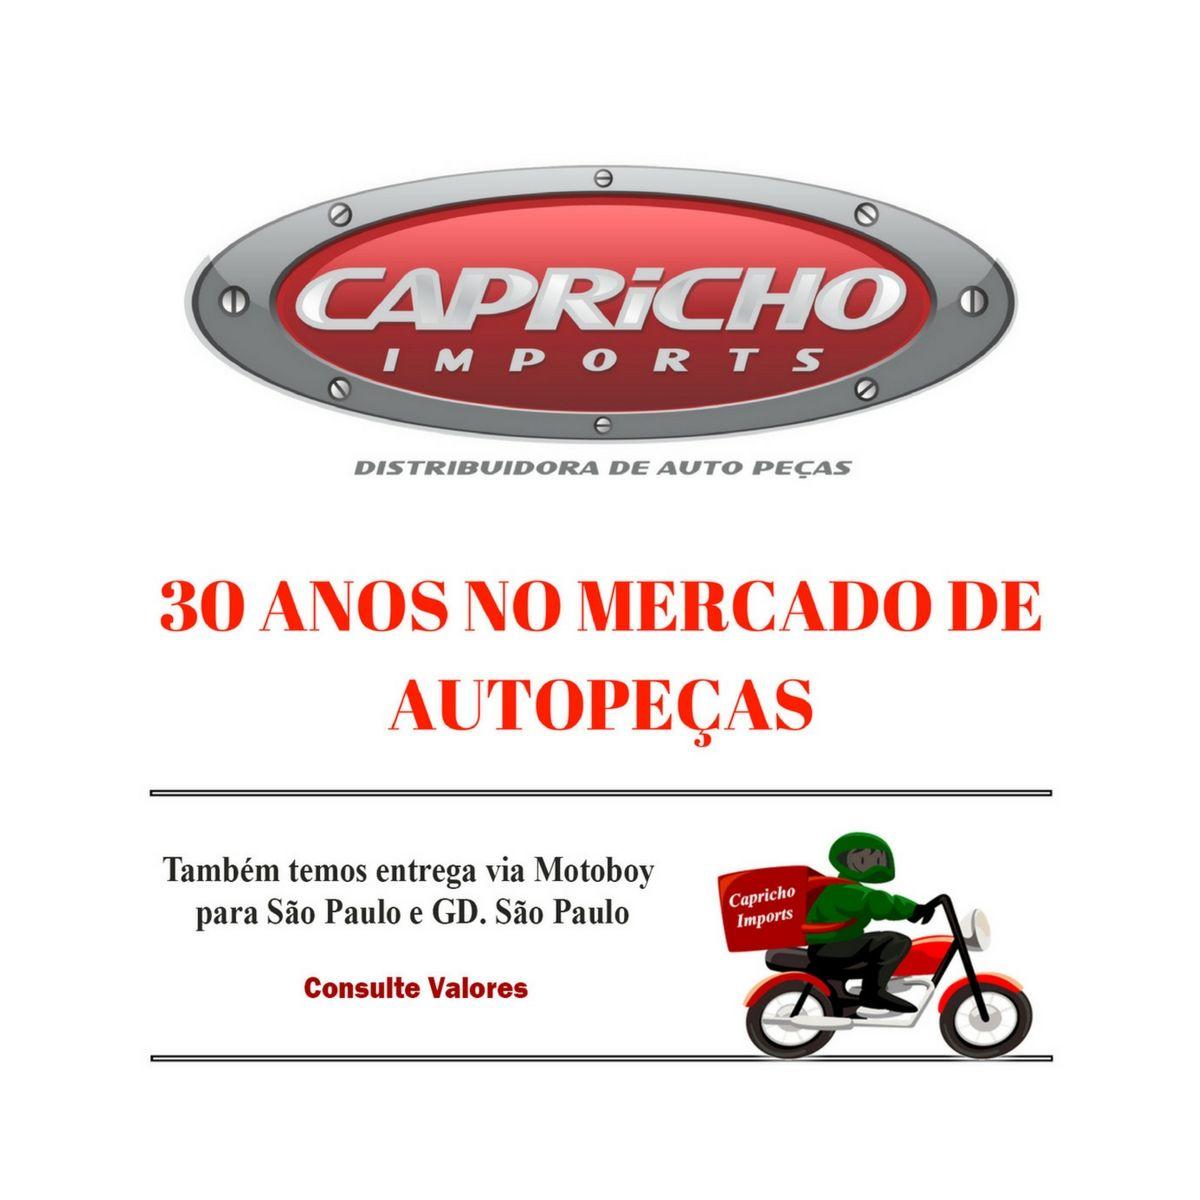 CILINDRO MESTRE DE FREIO - VOLKSWAGEN GOLF GTI / PASSAT / PASSAT VARIANT / POLO CLASSIC - SEM ABS